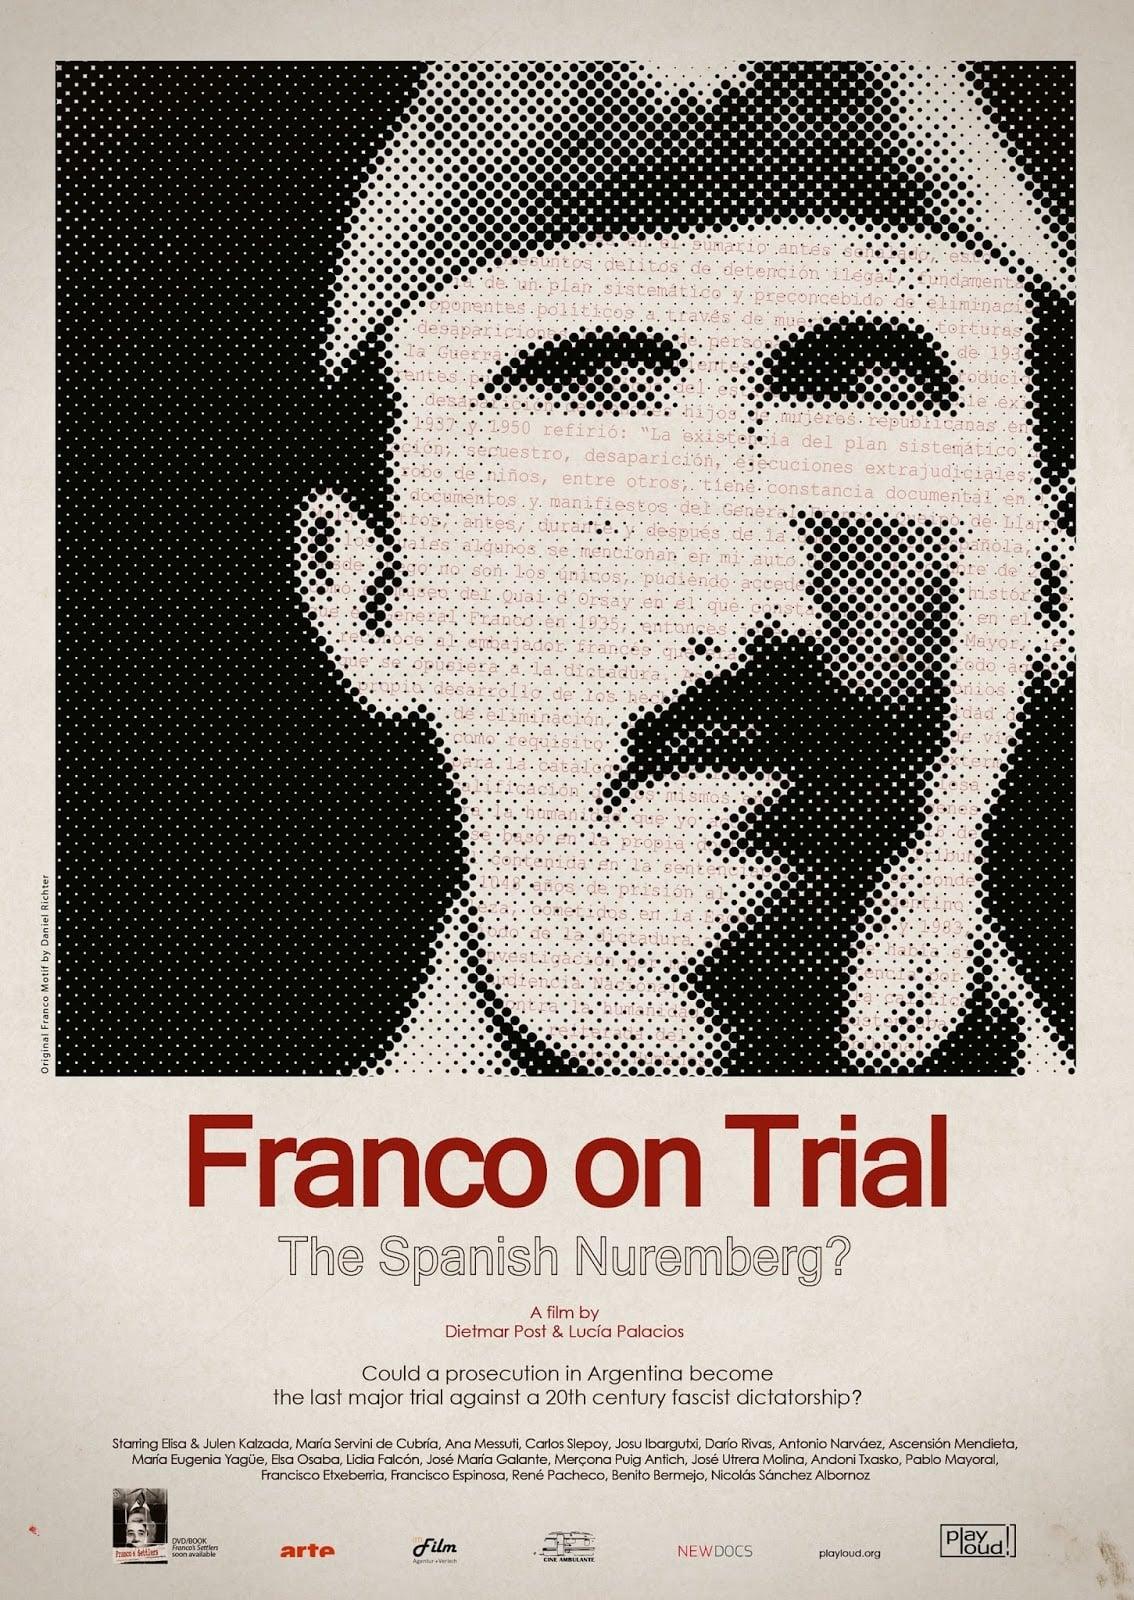 Franco on Trial: The Spanish Nuremberg?